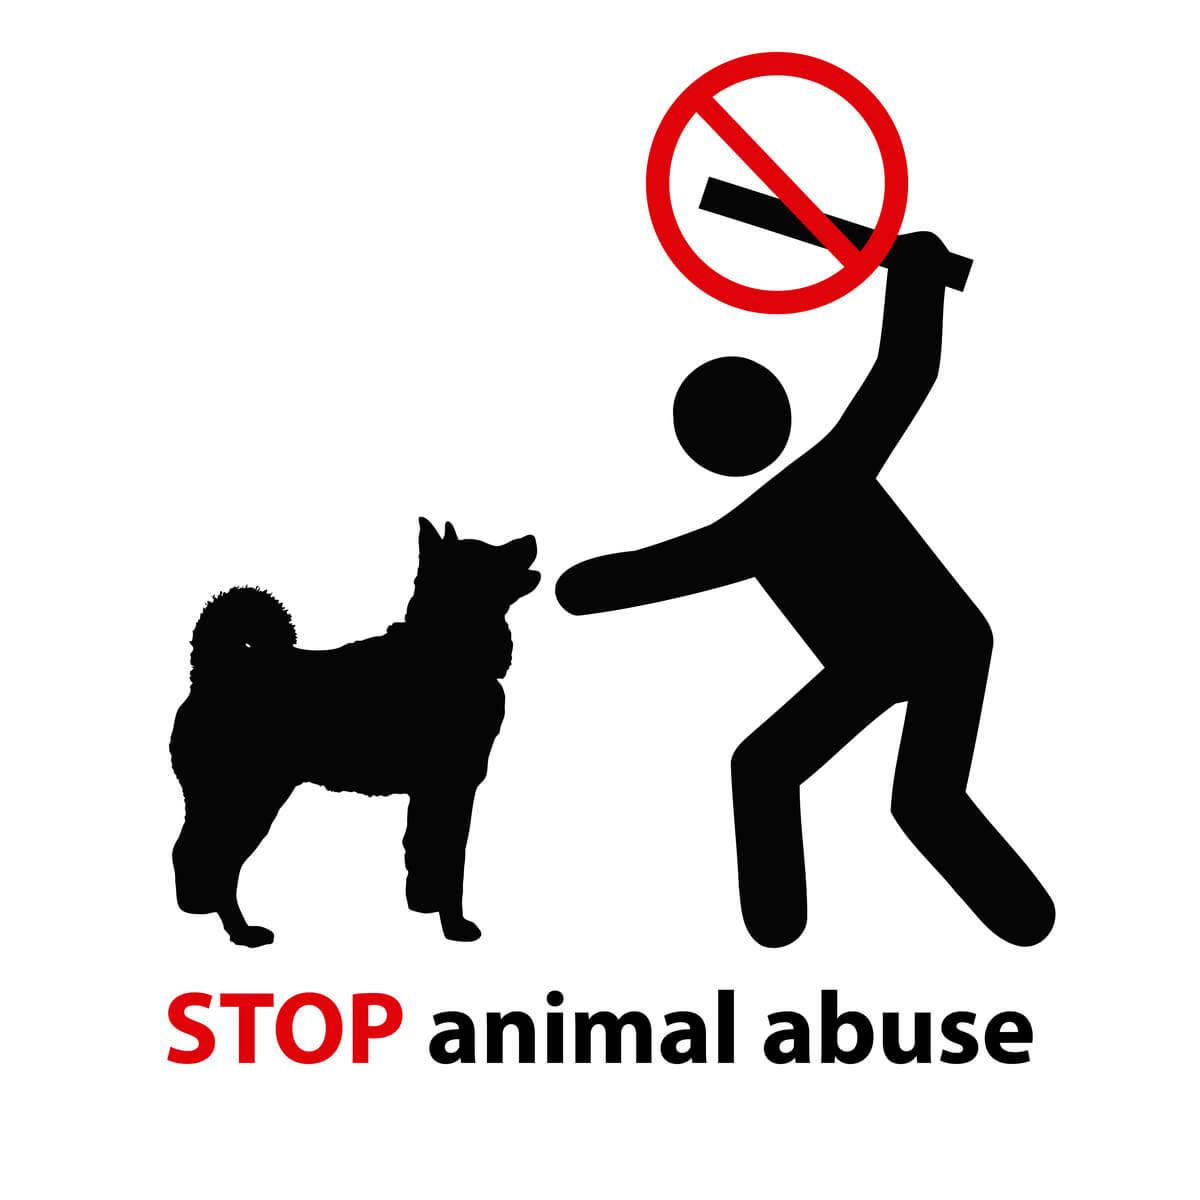 Un vector de un abusador animal.